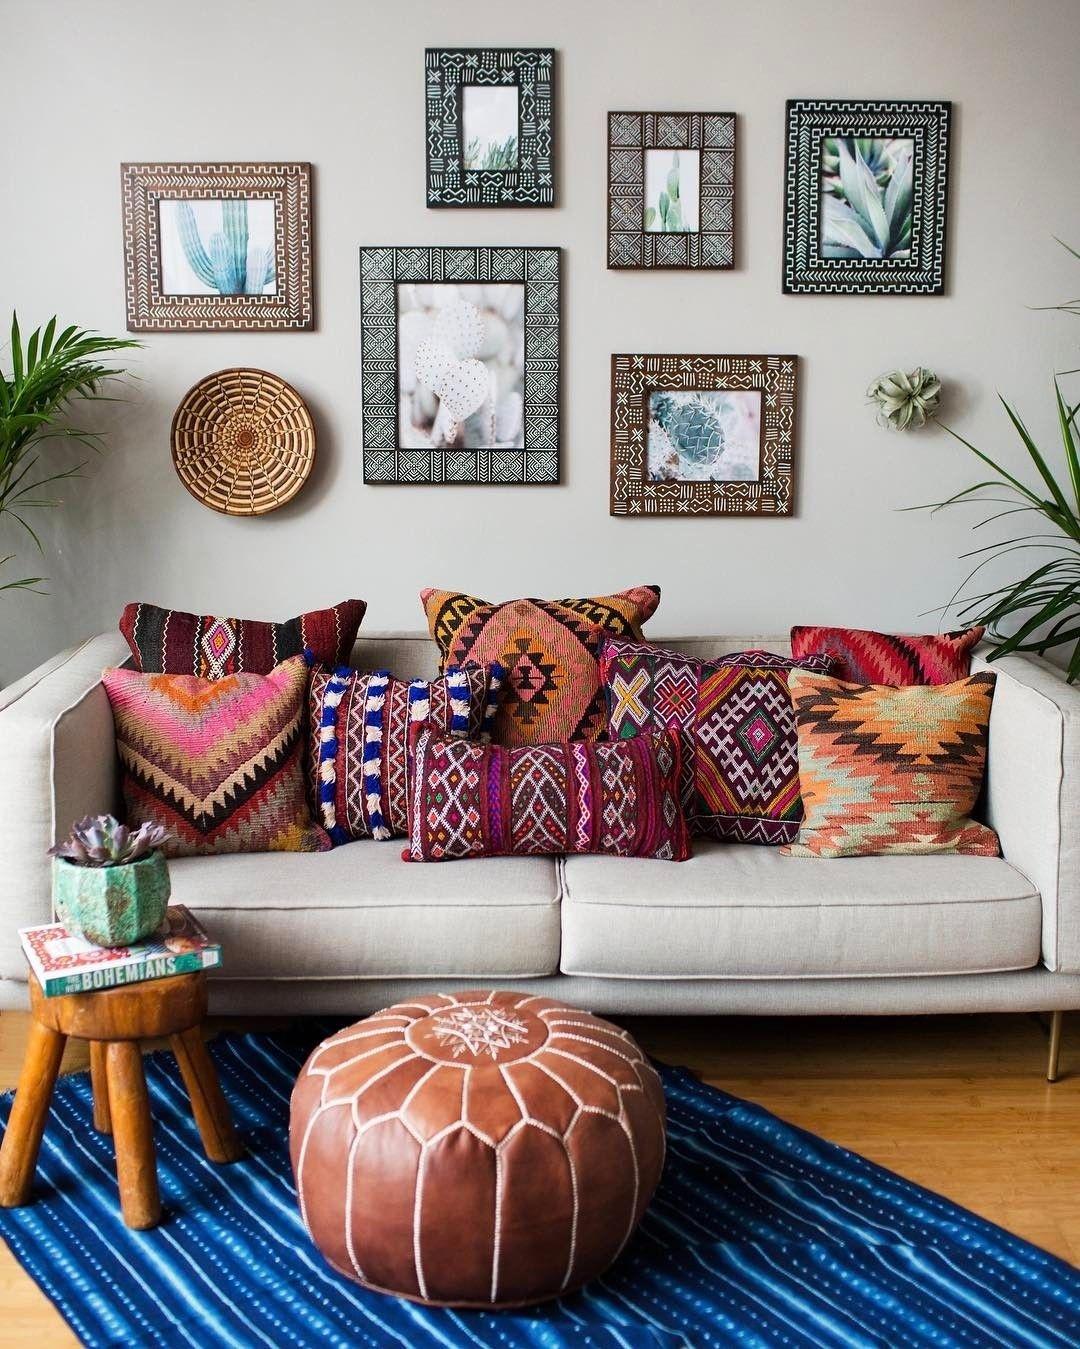 Boho Chic - textiles